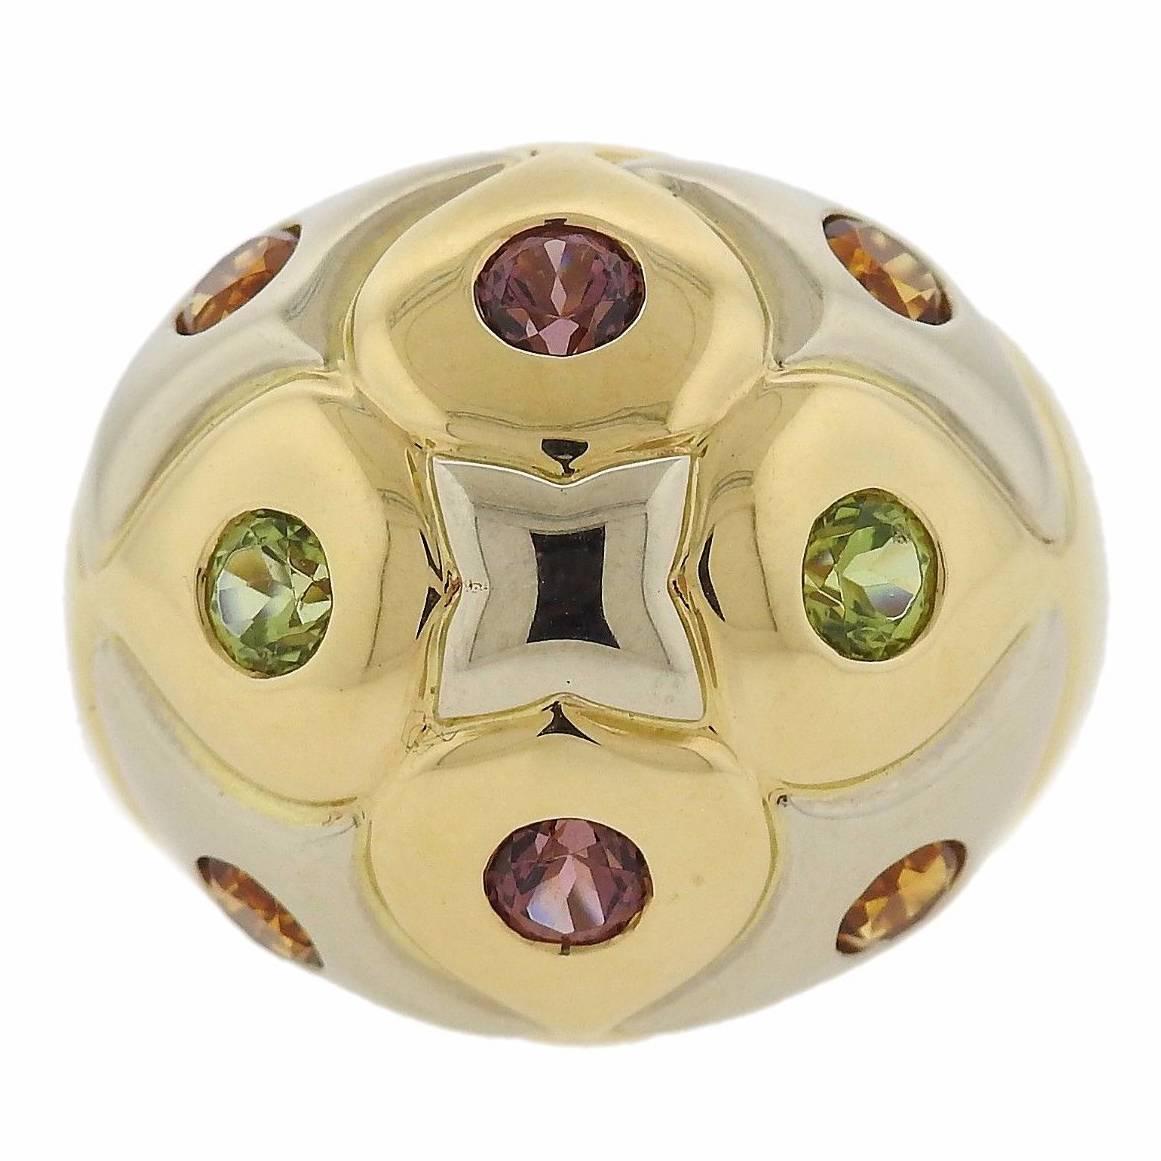 Bulgari Allegra Multicolor Gemstone Diamond Gold Ring at 1stdibs